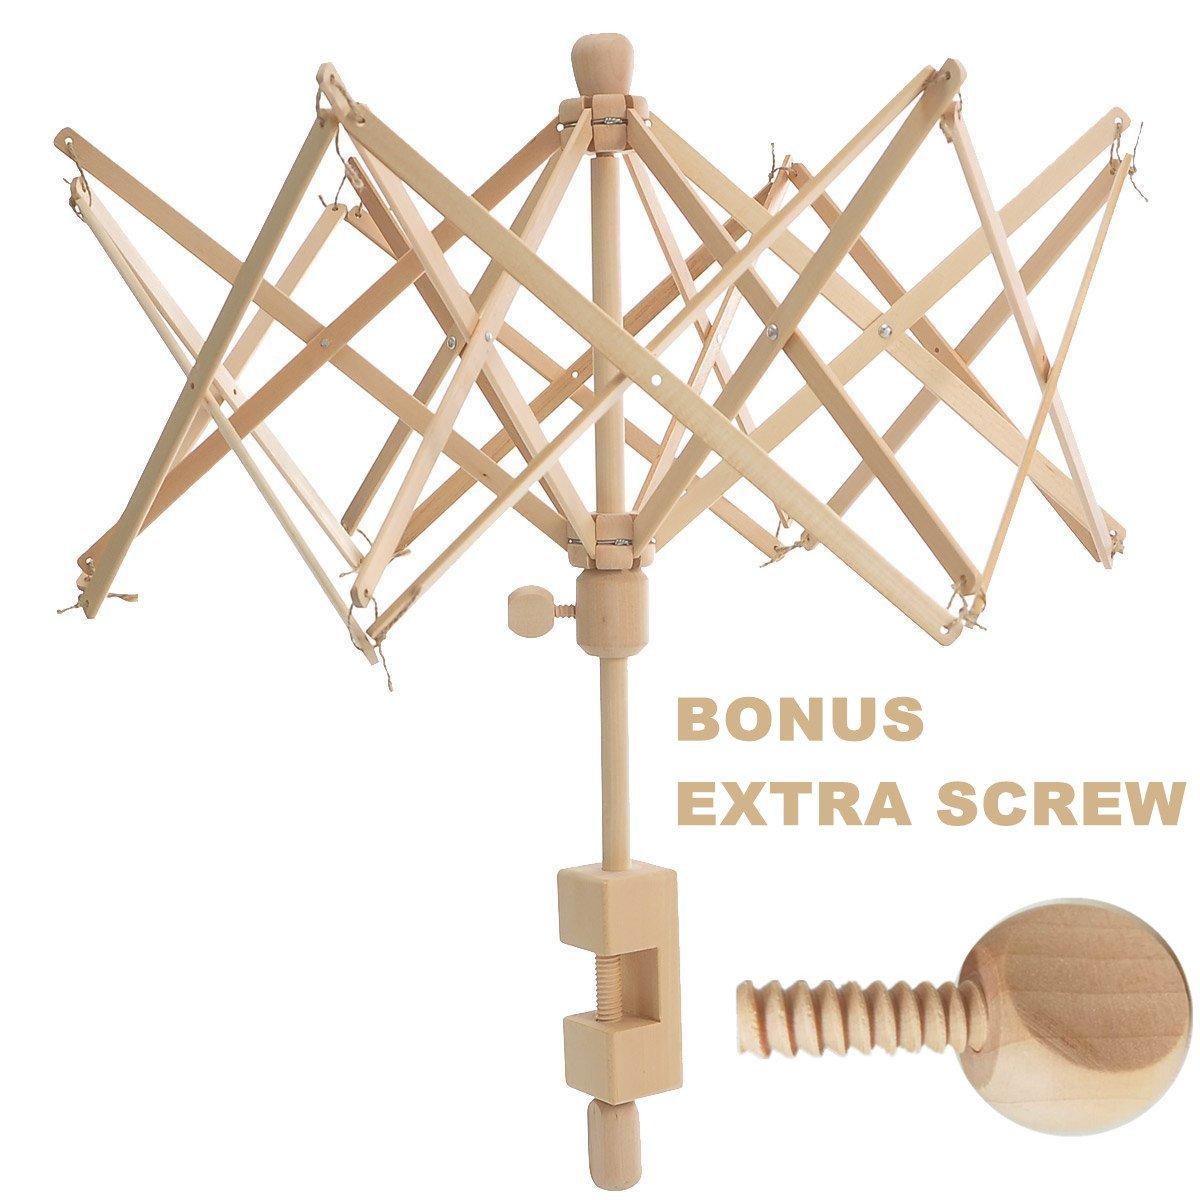 Wooden Umbrella Swift Yarn Winder Holder with Replacement Screw, Adjustable Yarn Swift,Medium